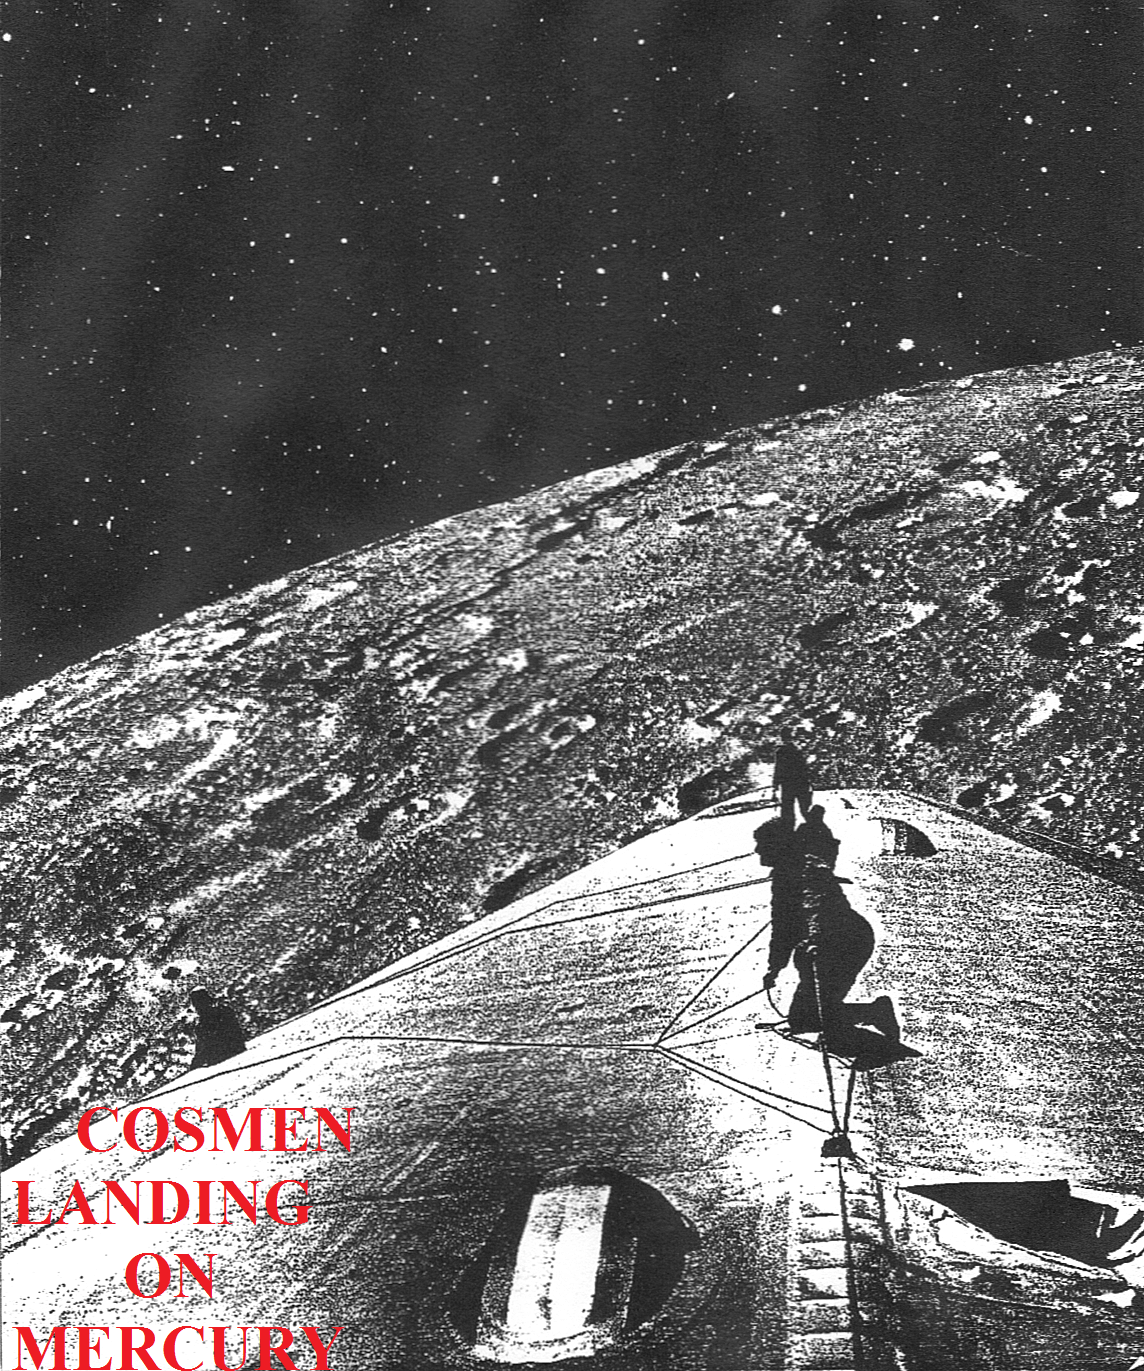 RG Cameron - Cosmic Clod - Cosmen Mercury